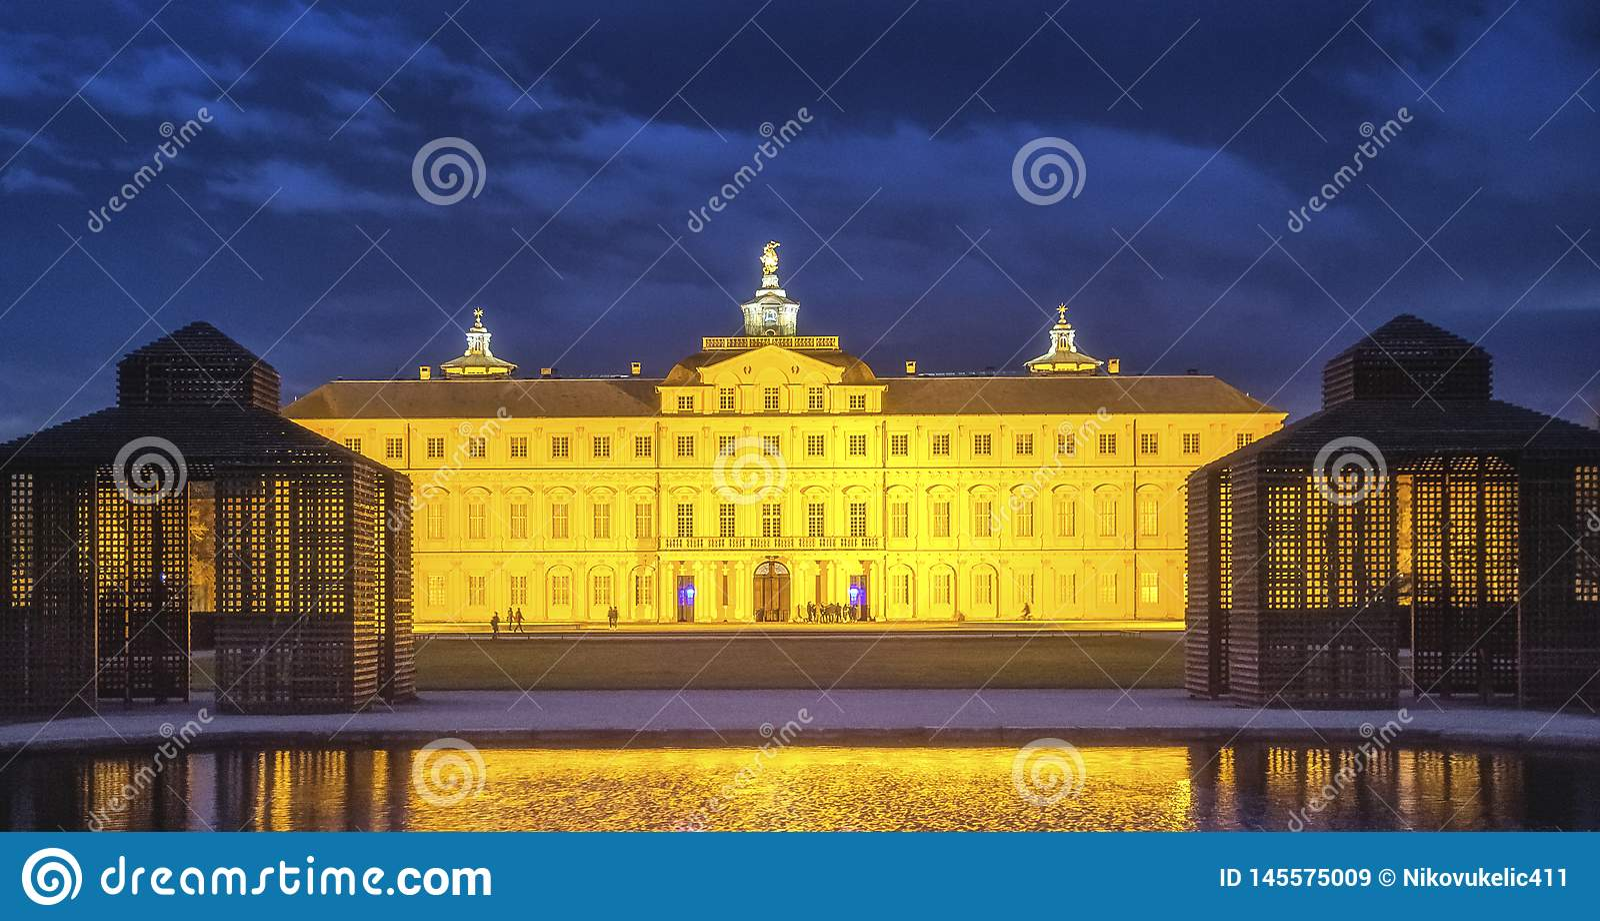 Residence castle in Rastatt,Germany at night